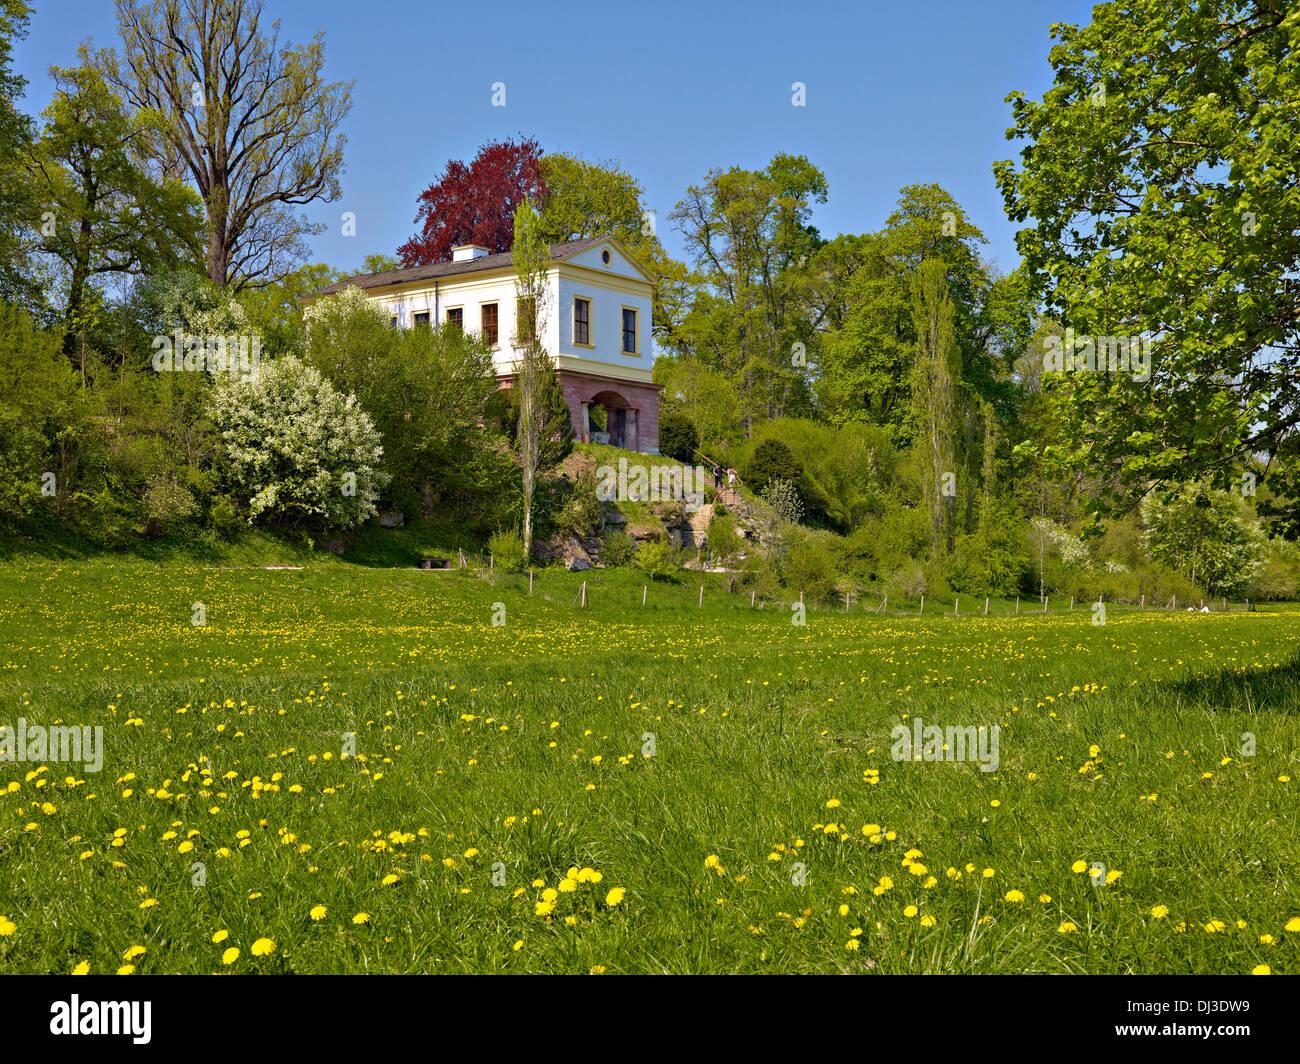 r mische haus in ilm park weimar th ringen stockfoto bild 62771669 alamy. Black Bedroom Furniture Sets. Home Design Ideas